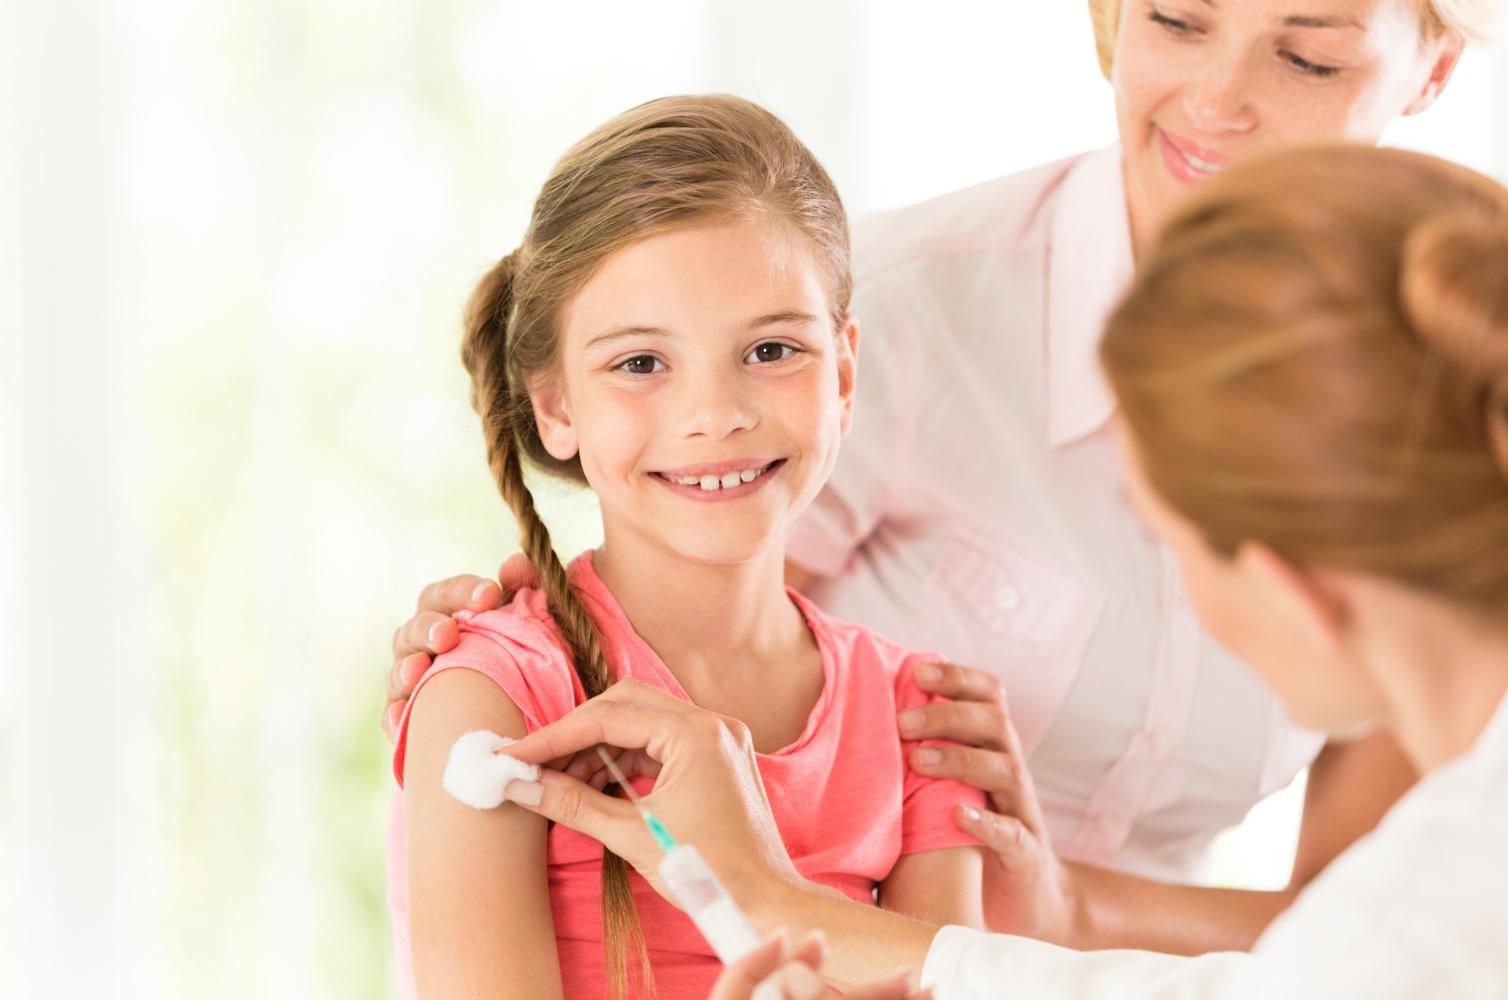 embolio emvolio εμβόλιο αντιγρηπικό εμβολιασμός